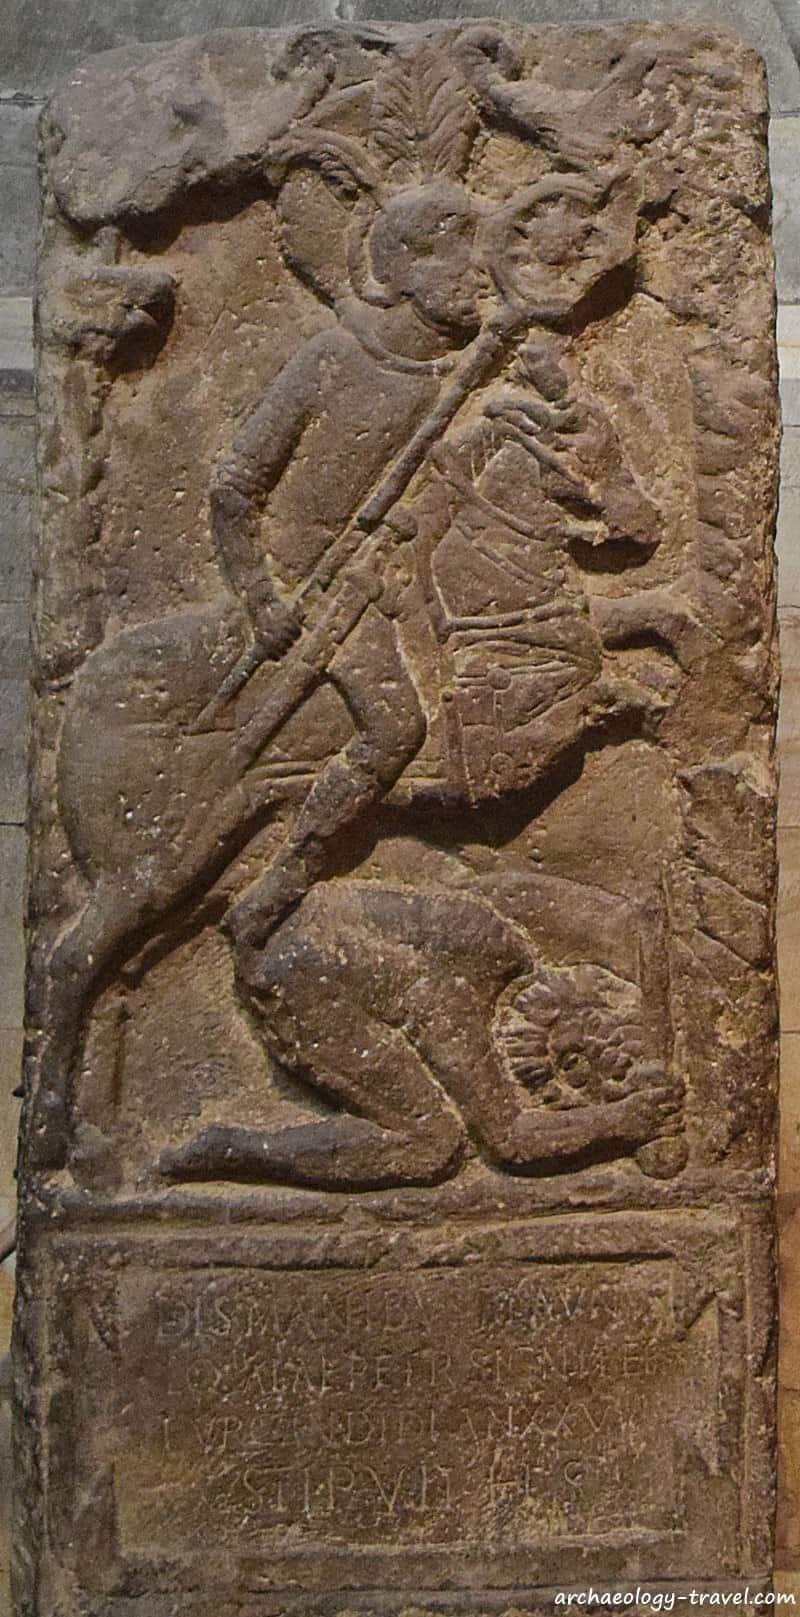 The Flavinus tombstone in Hexham Abbey.